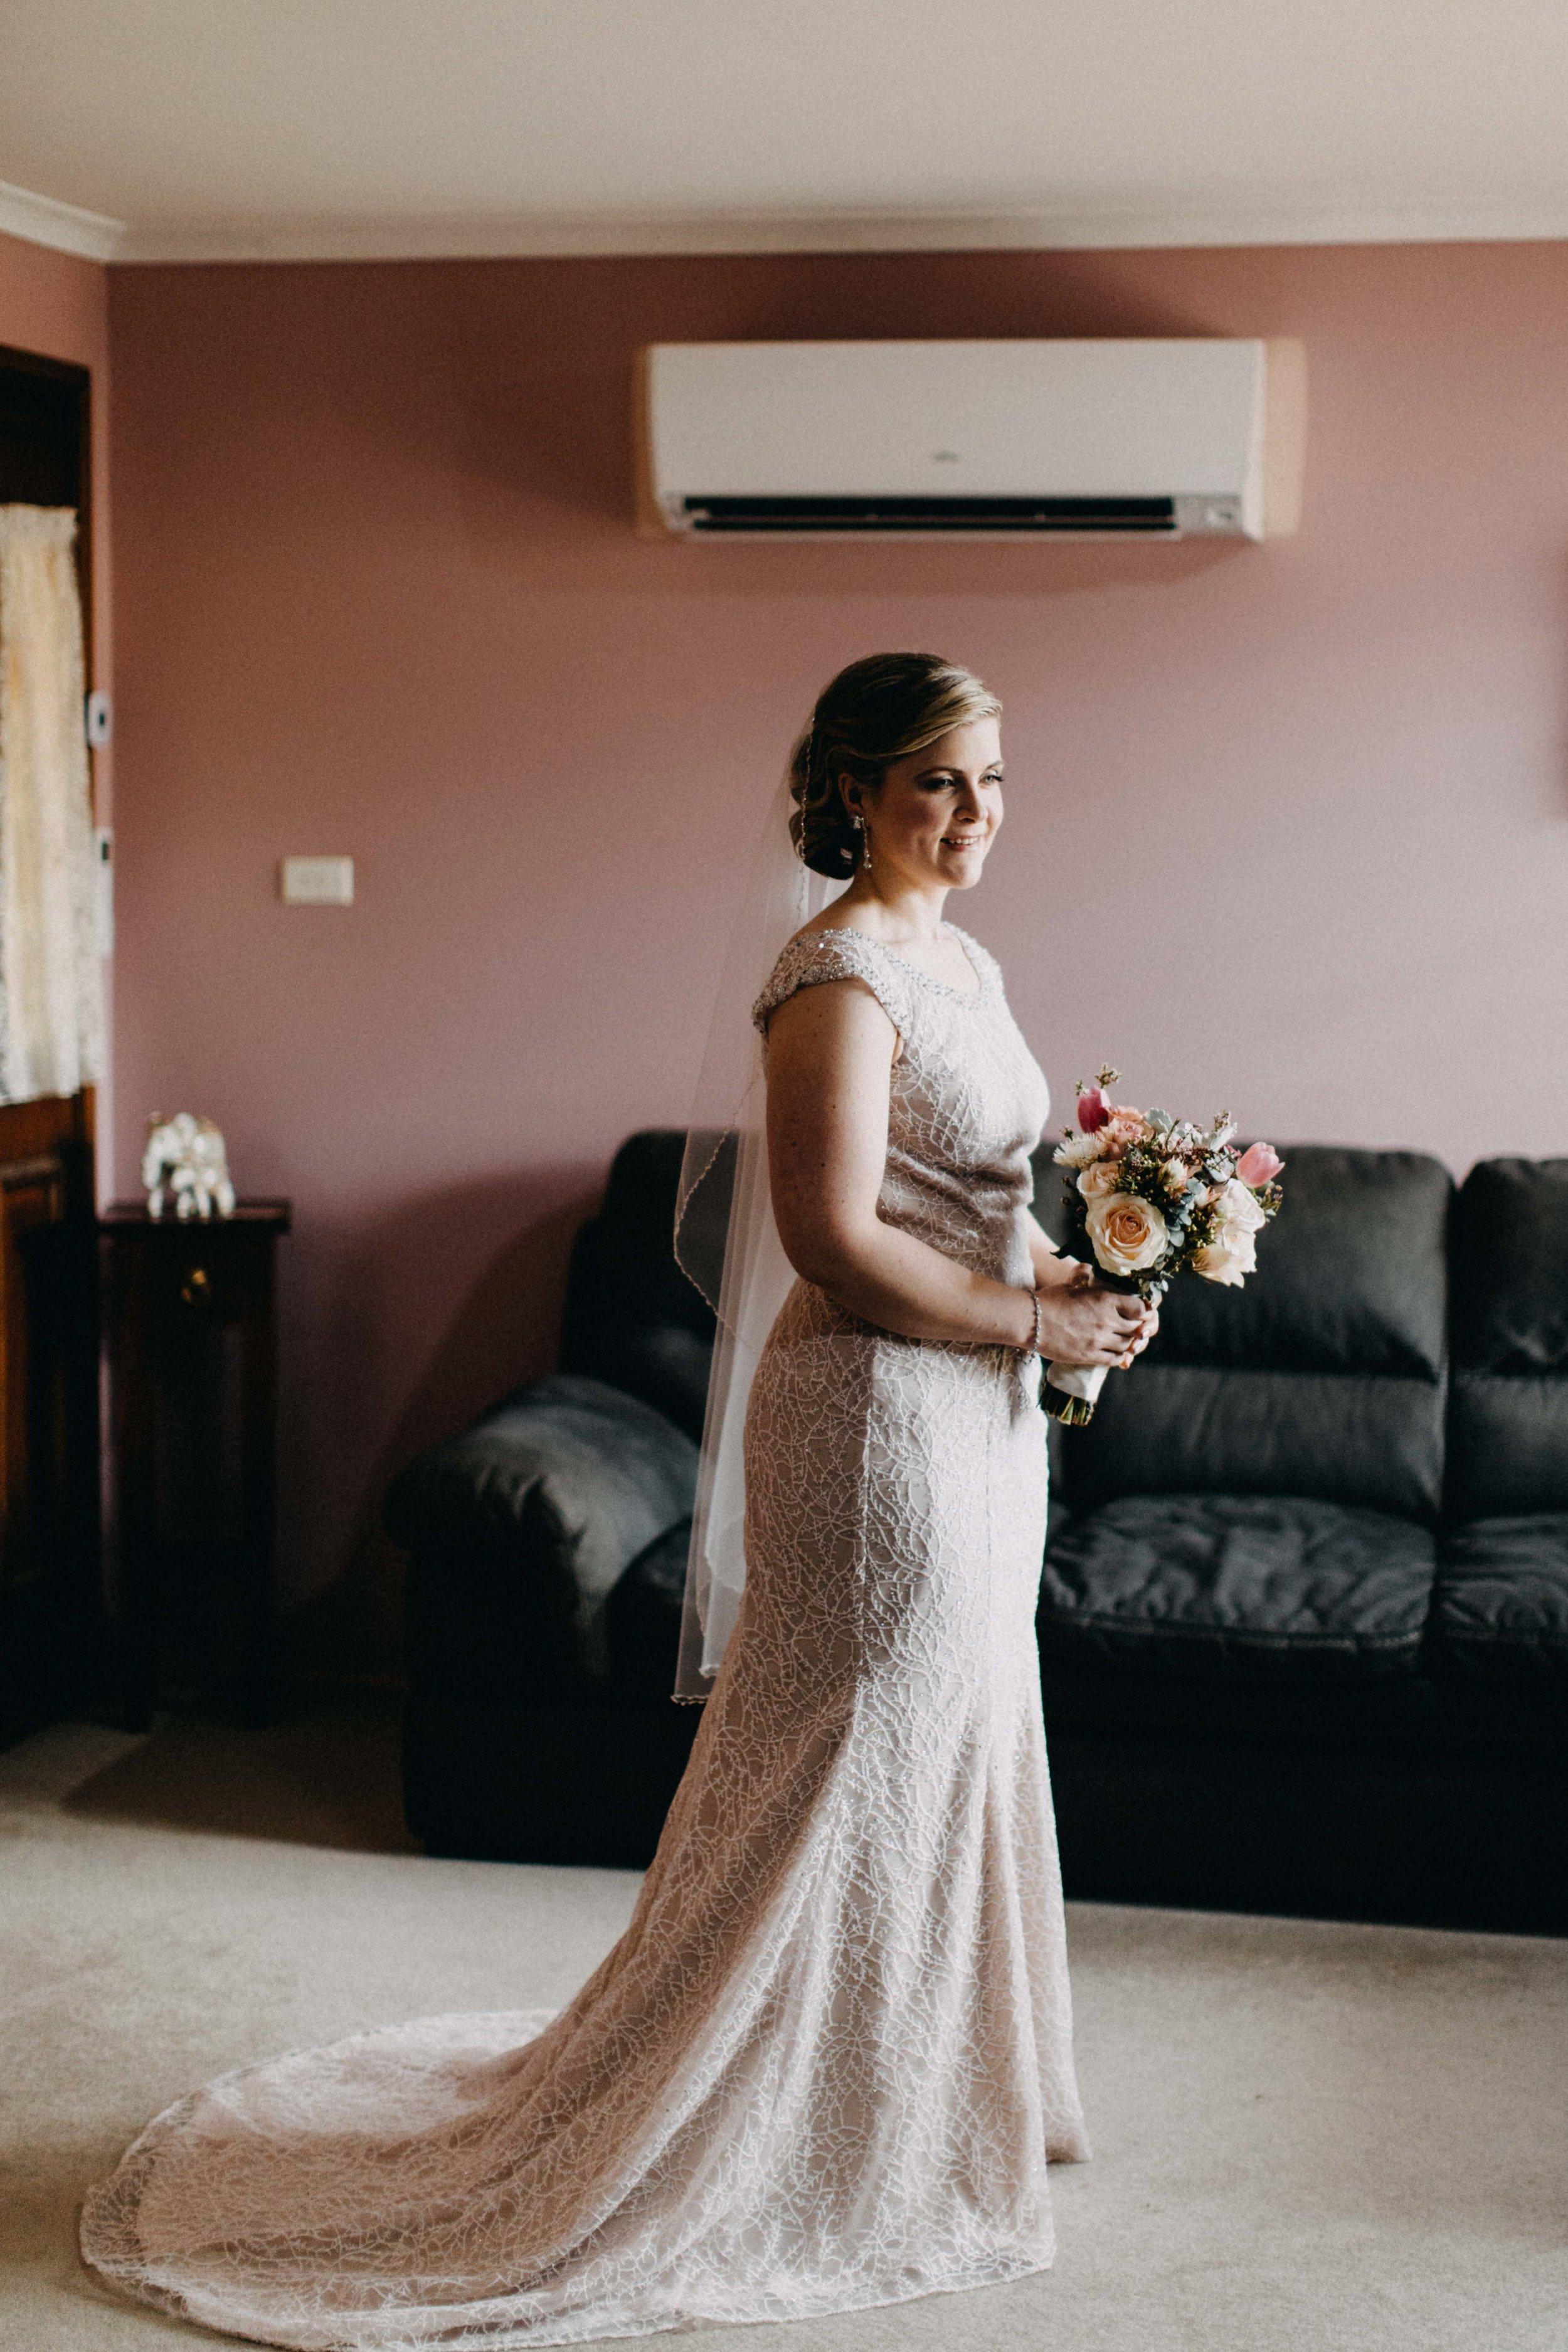 appin-house-wedding-macarthur-www.emilyobrienphotography.net-35.jpg